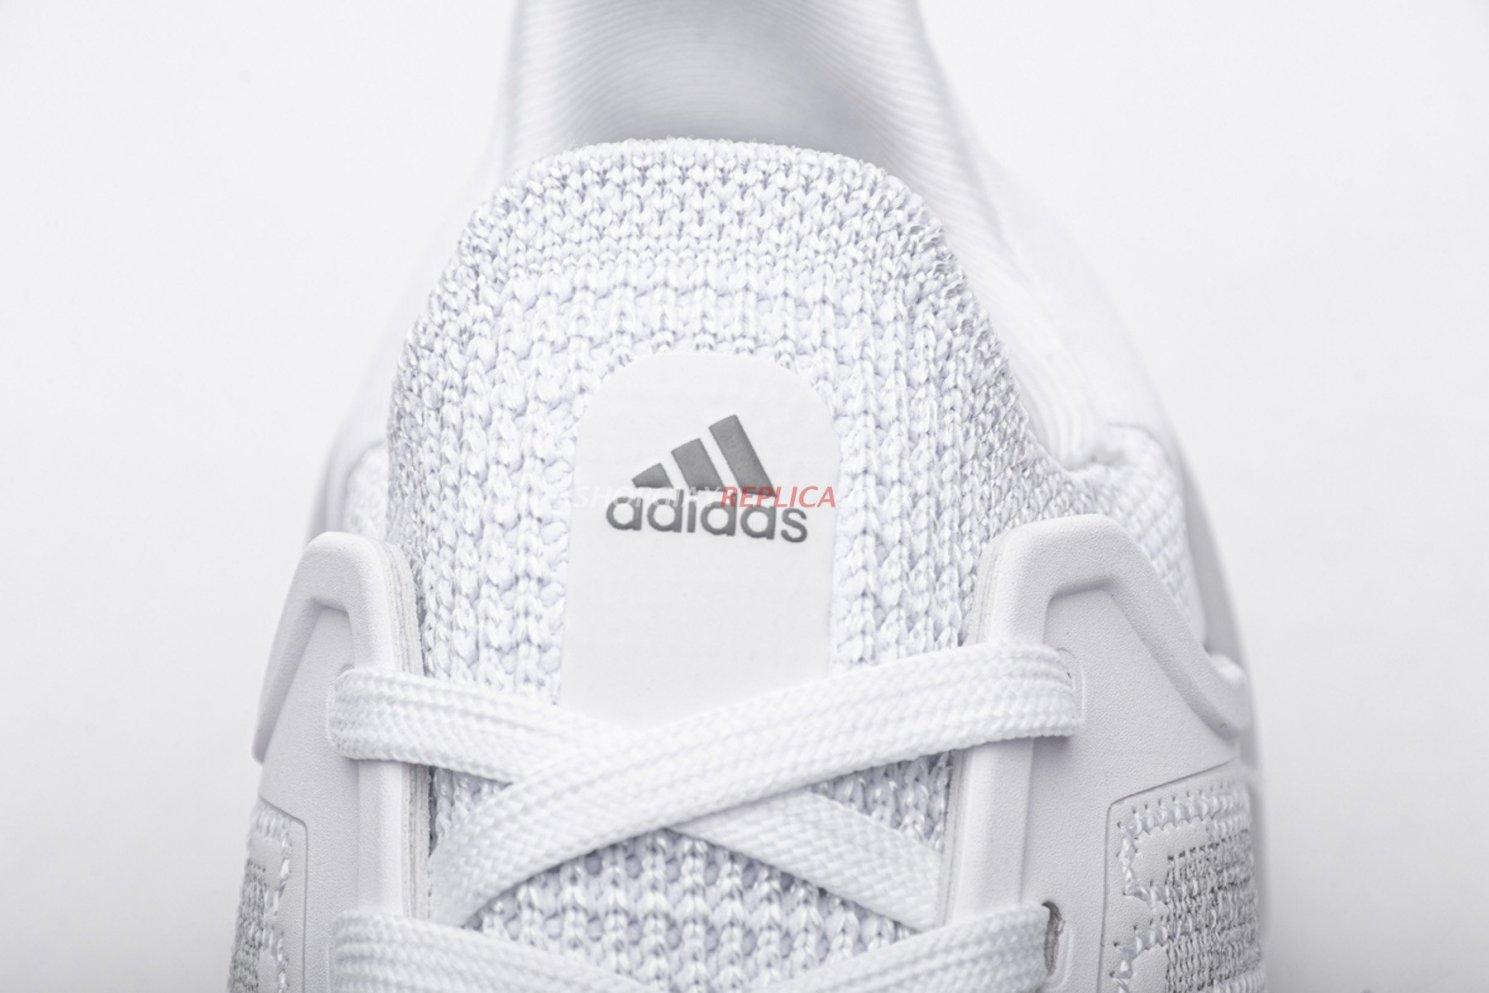 Giày Adidas Ultra Boost 2020 Triple White Rep 1:1